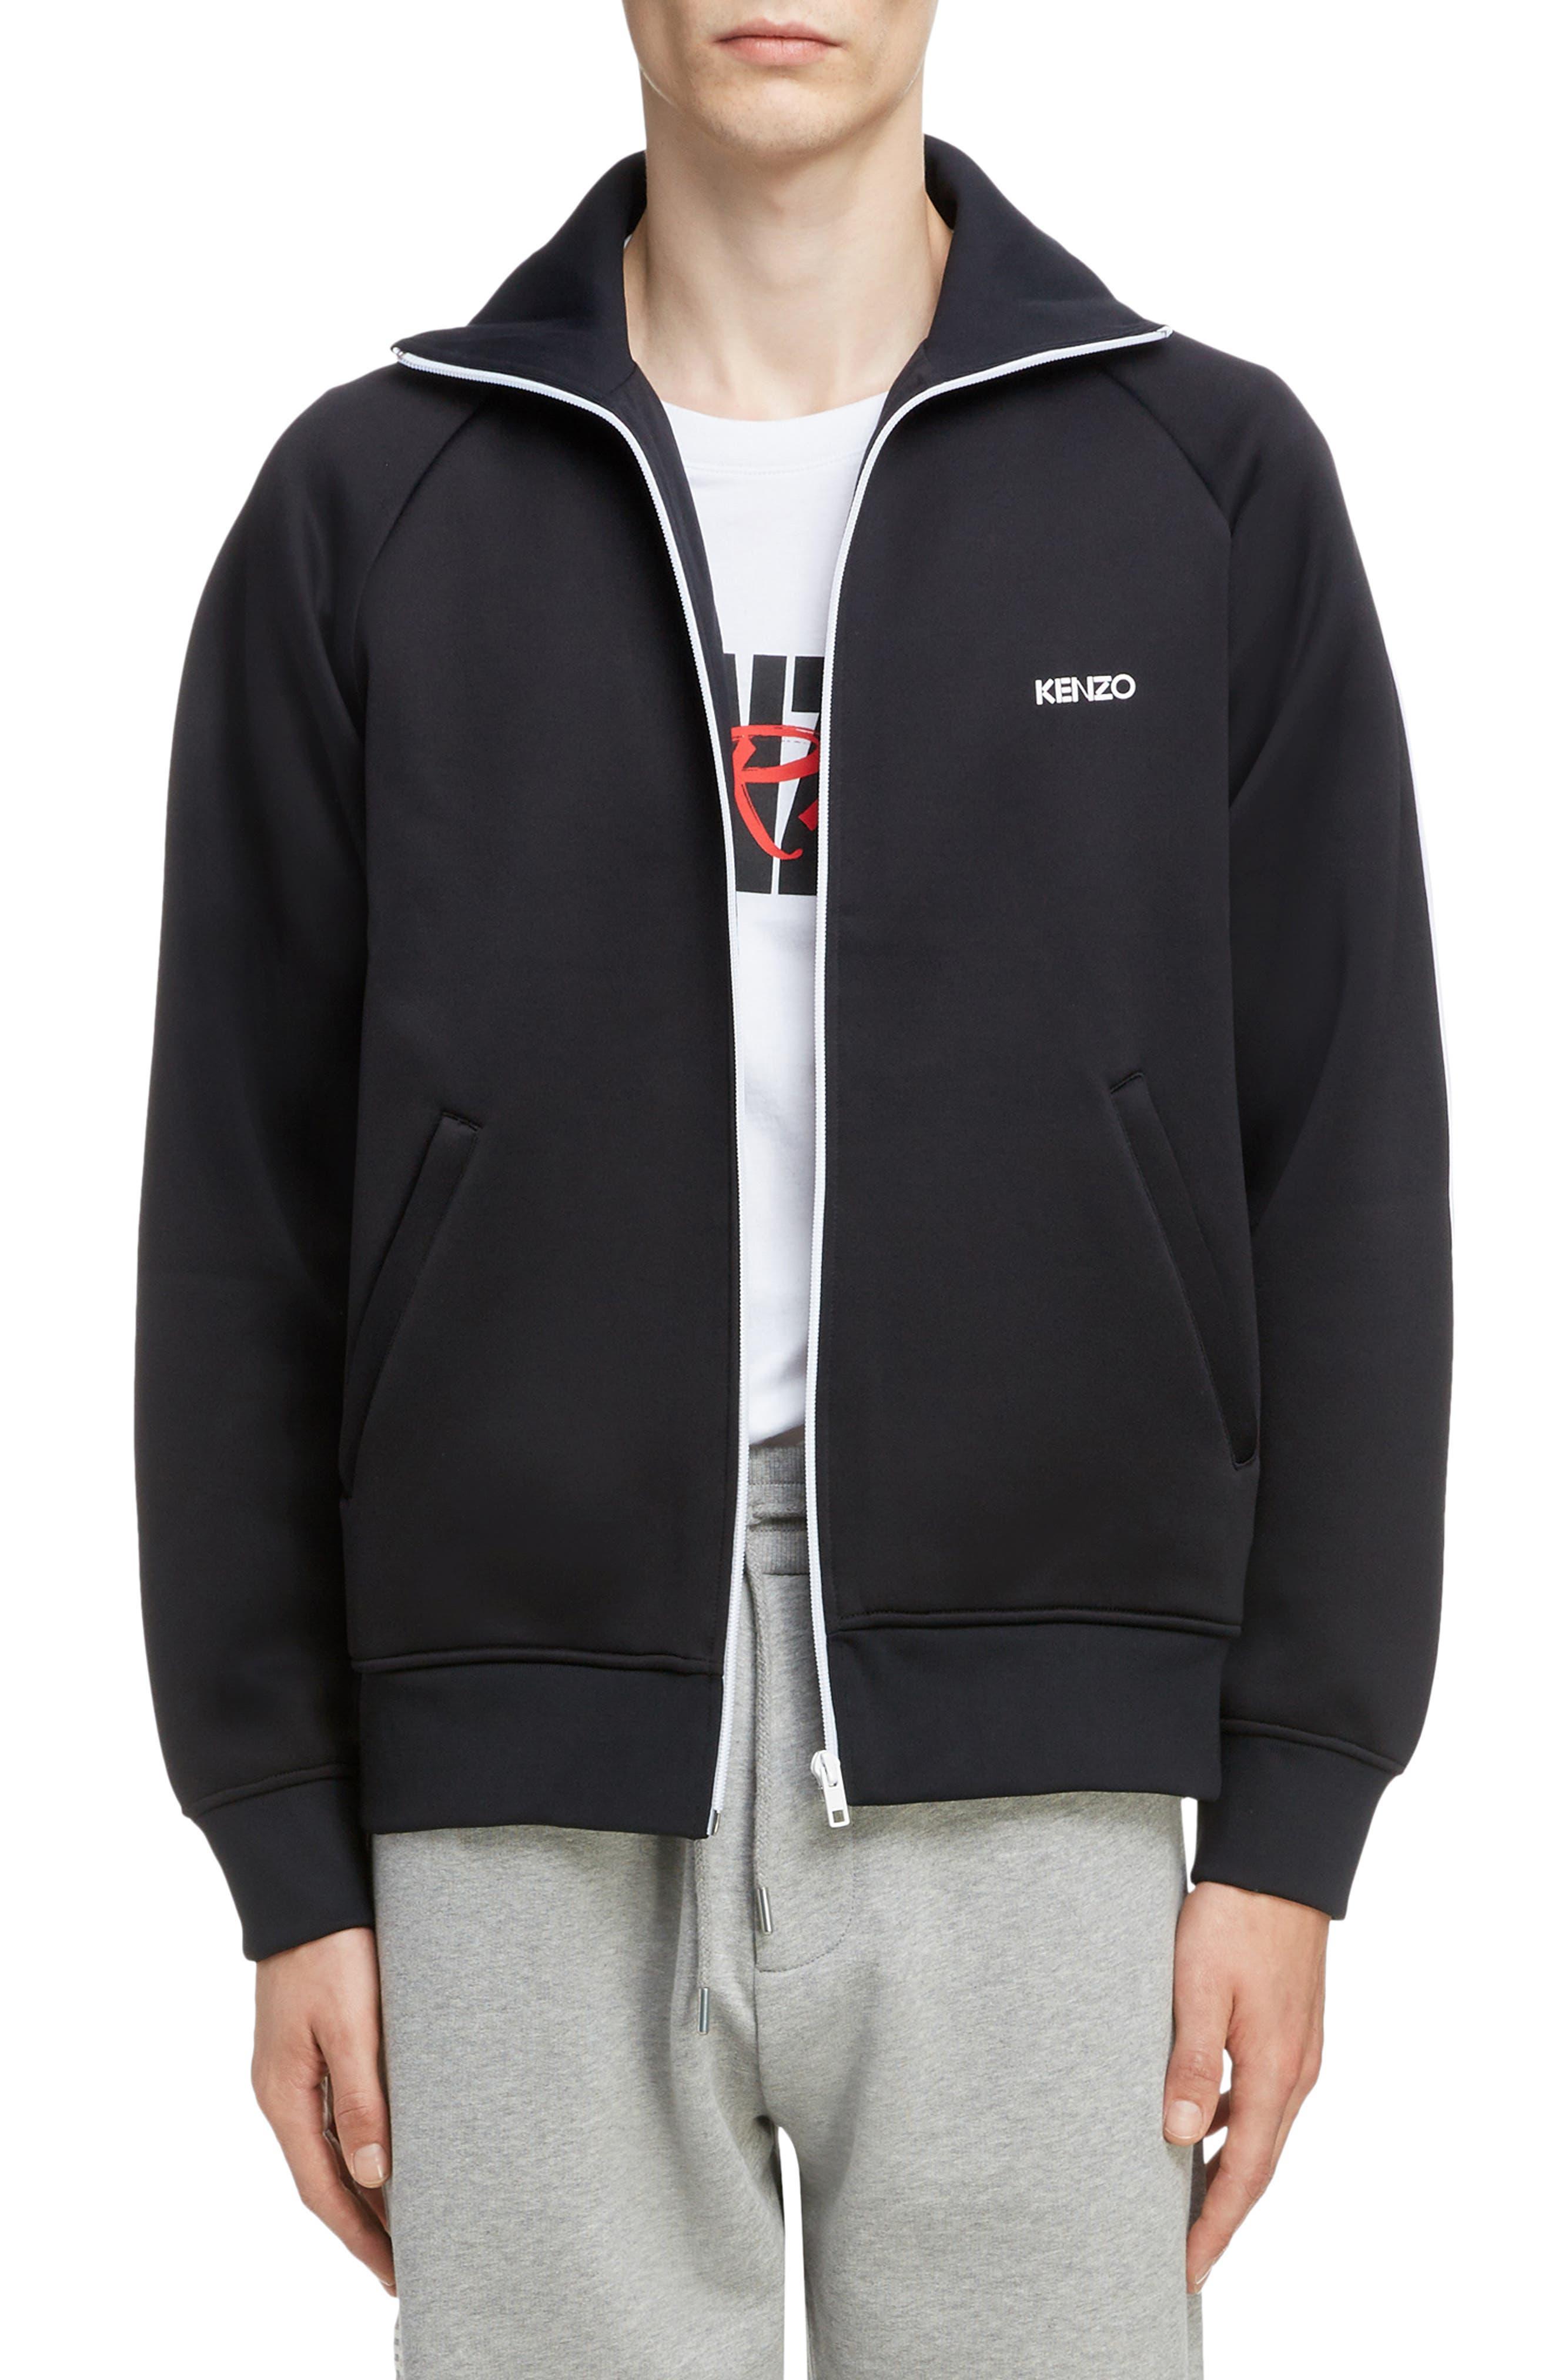 KENZO Zip Track Jacket, Main, color, BLACK